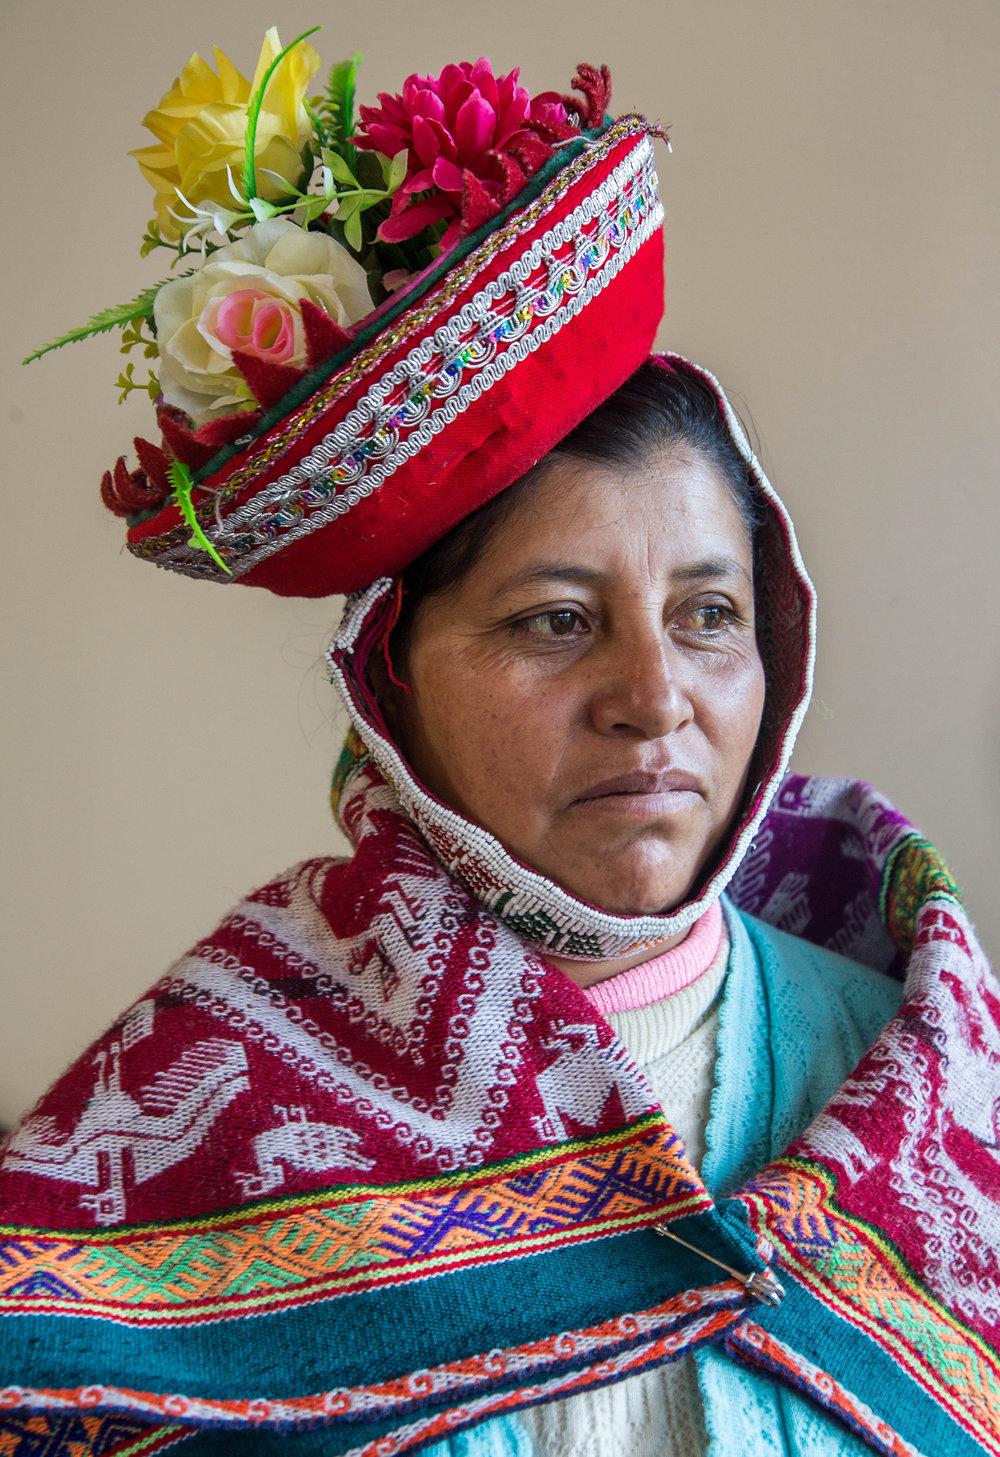 Peru-2808.jpg